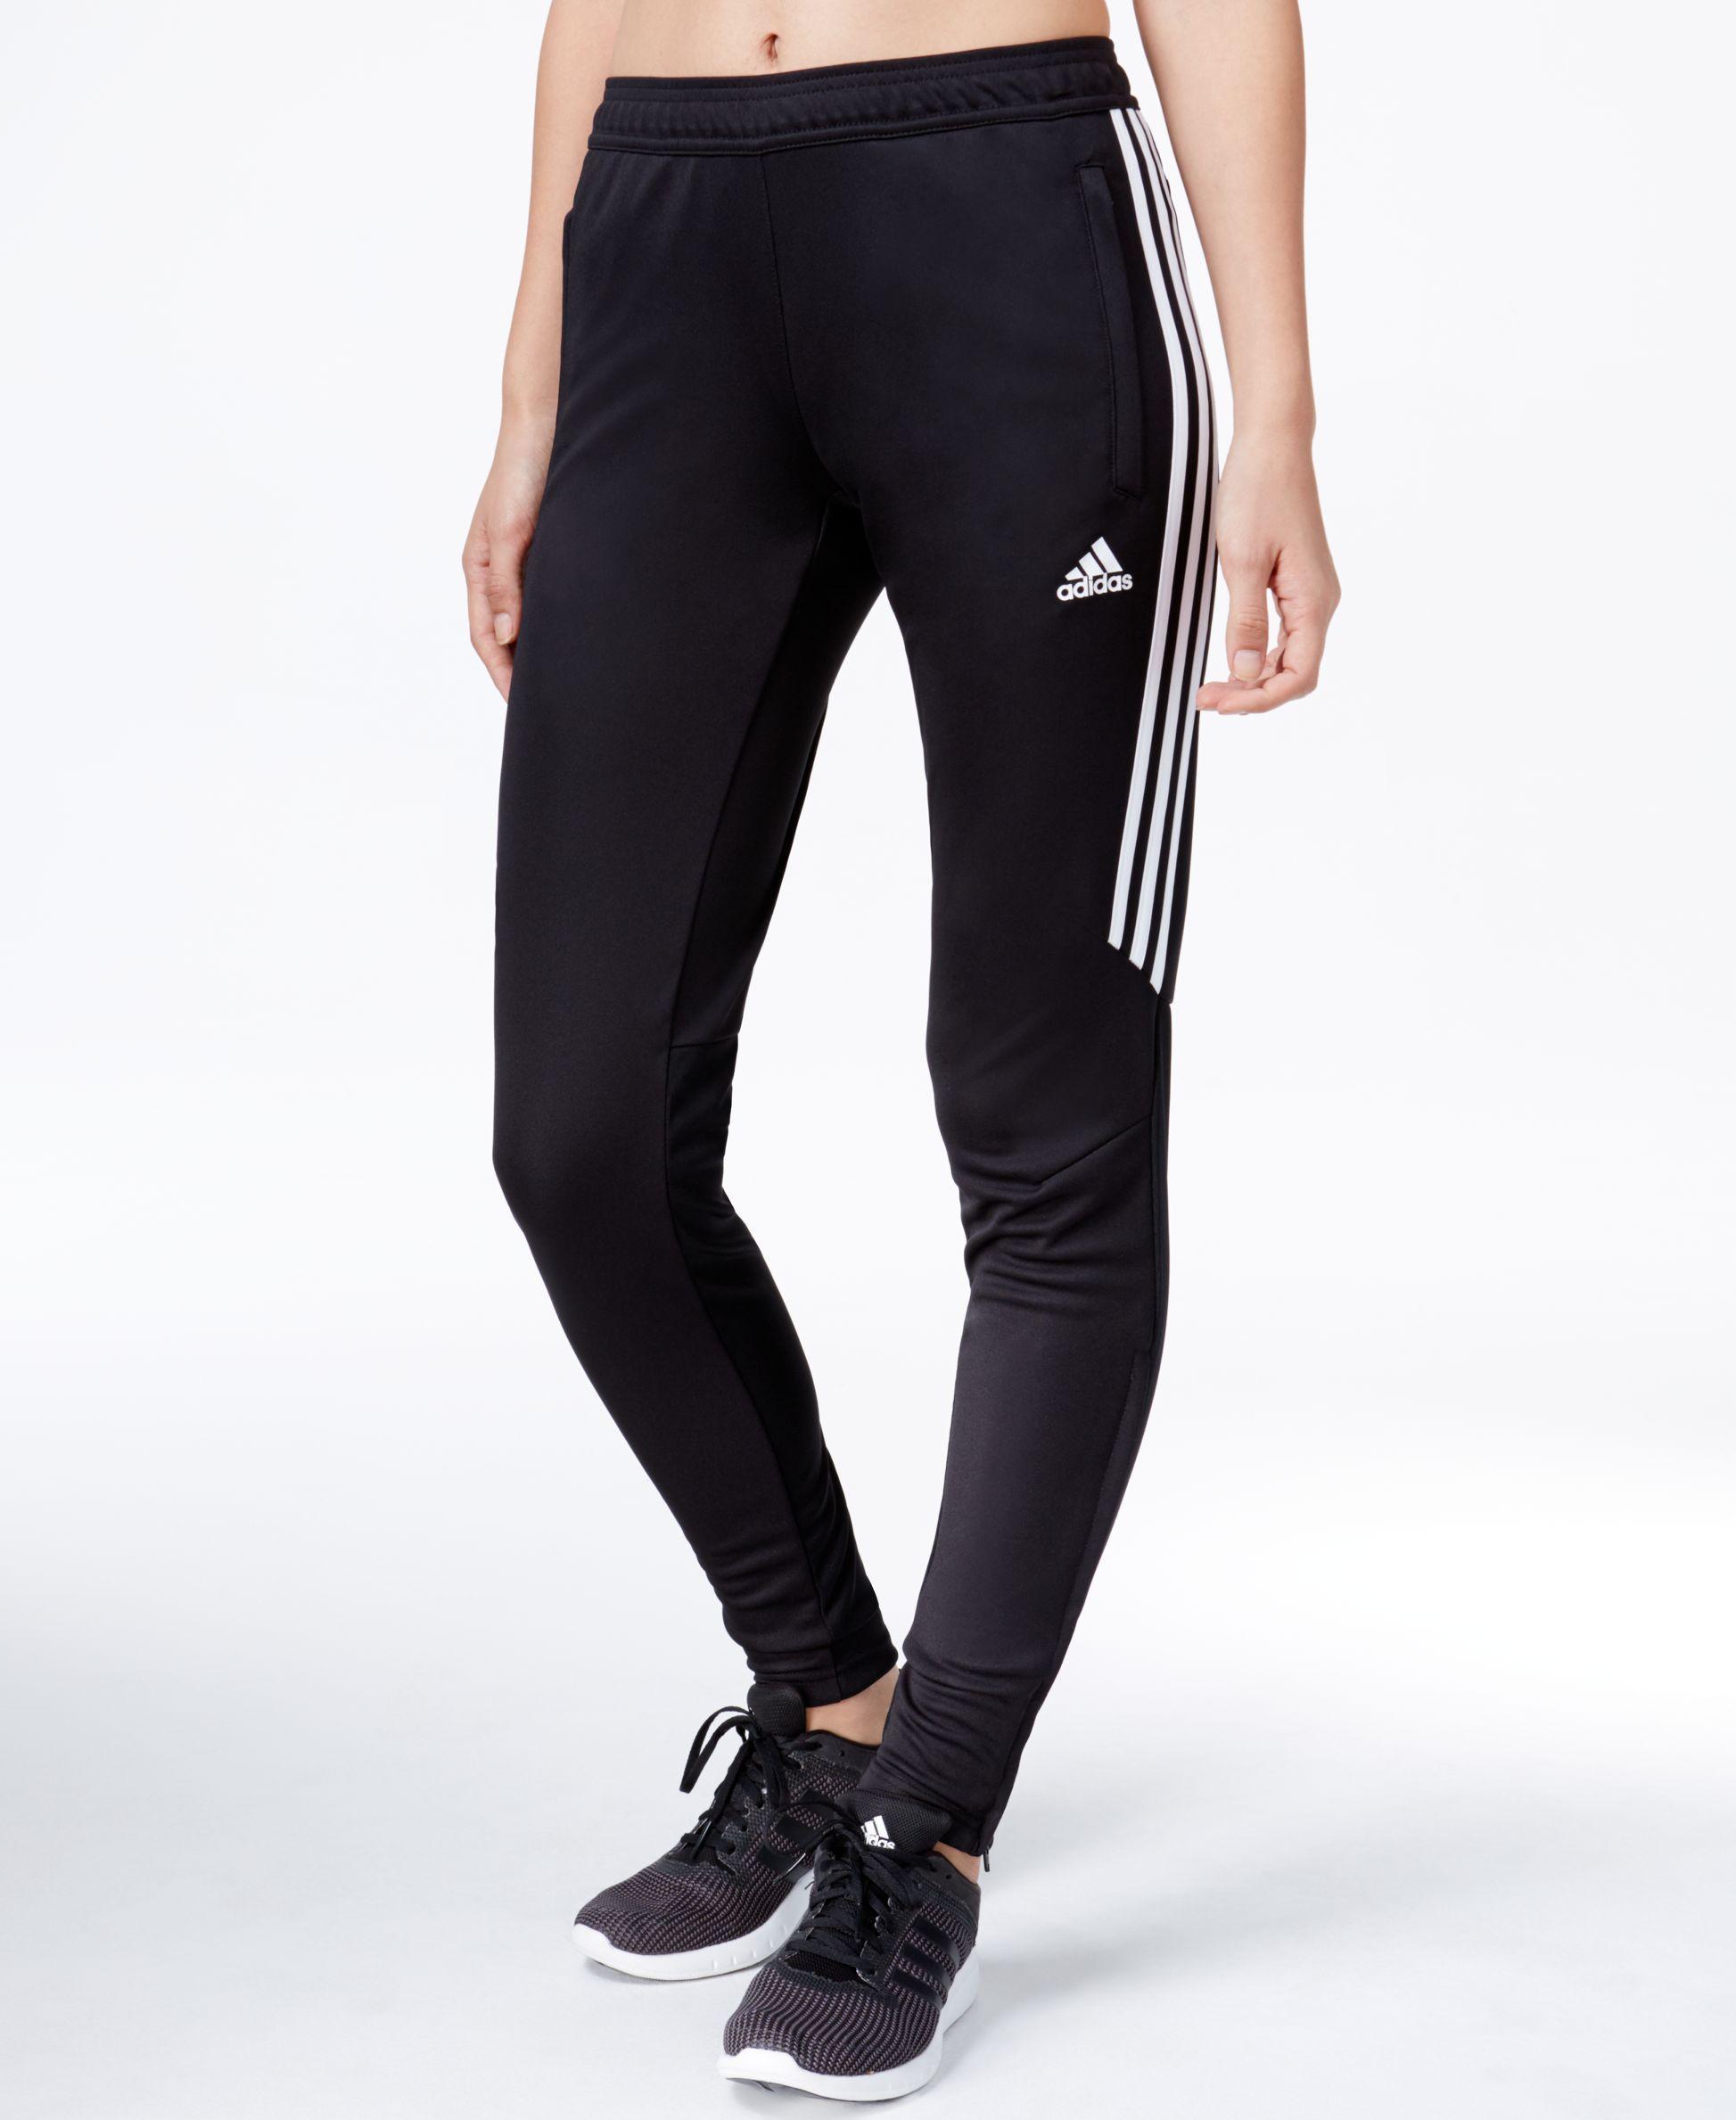 adidas Tiro ClimaCool Soccer Pants - Pants & Capris - Women - Macy's